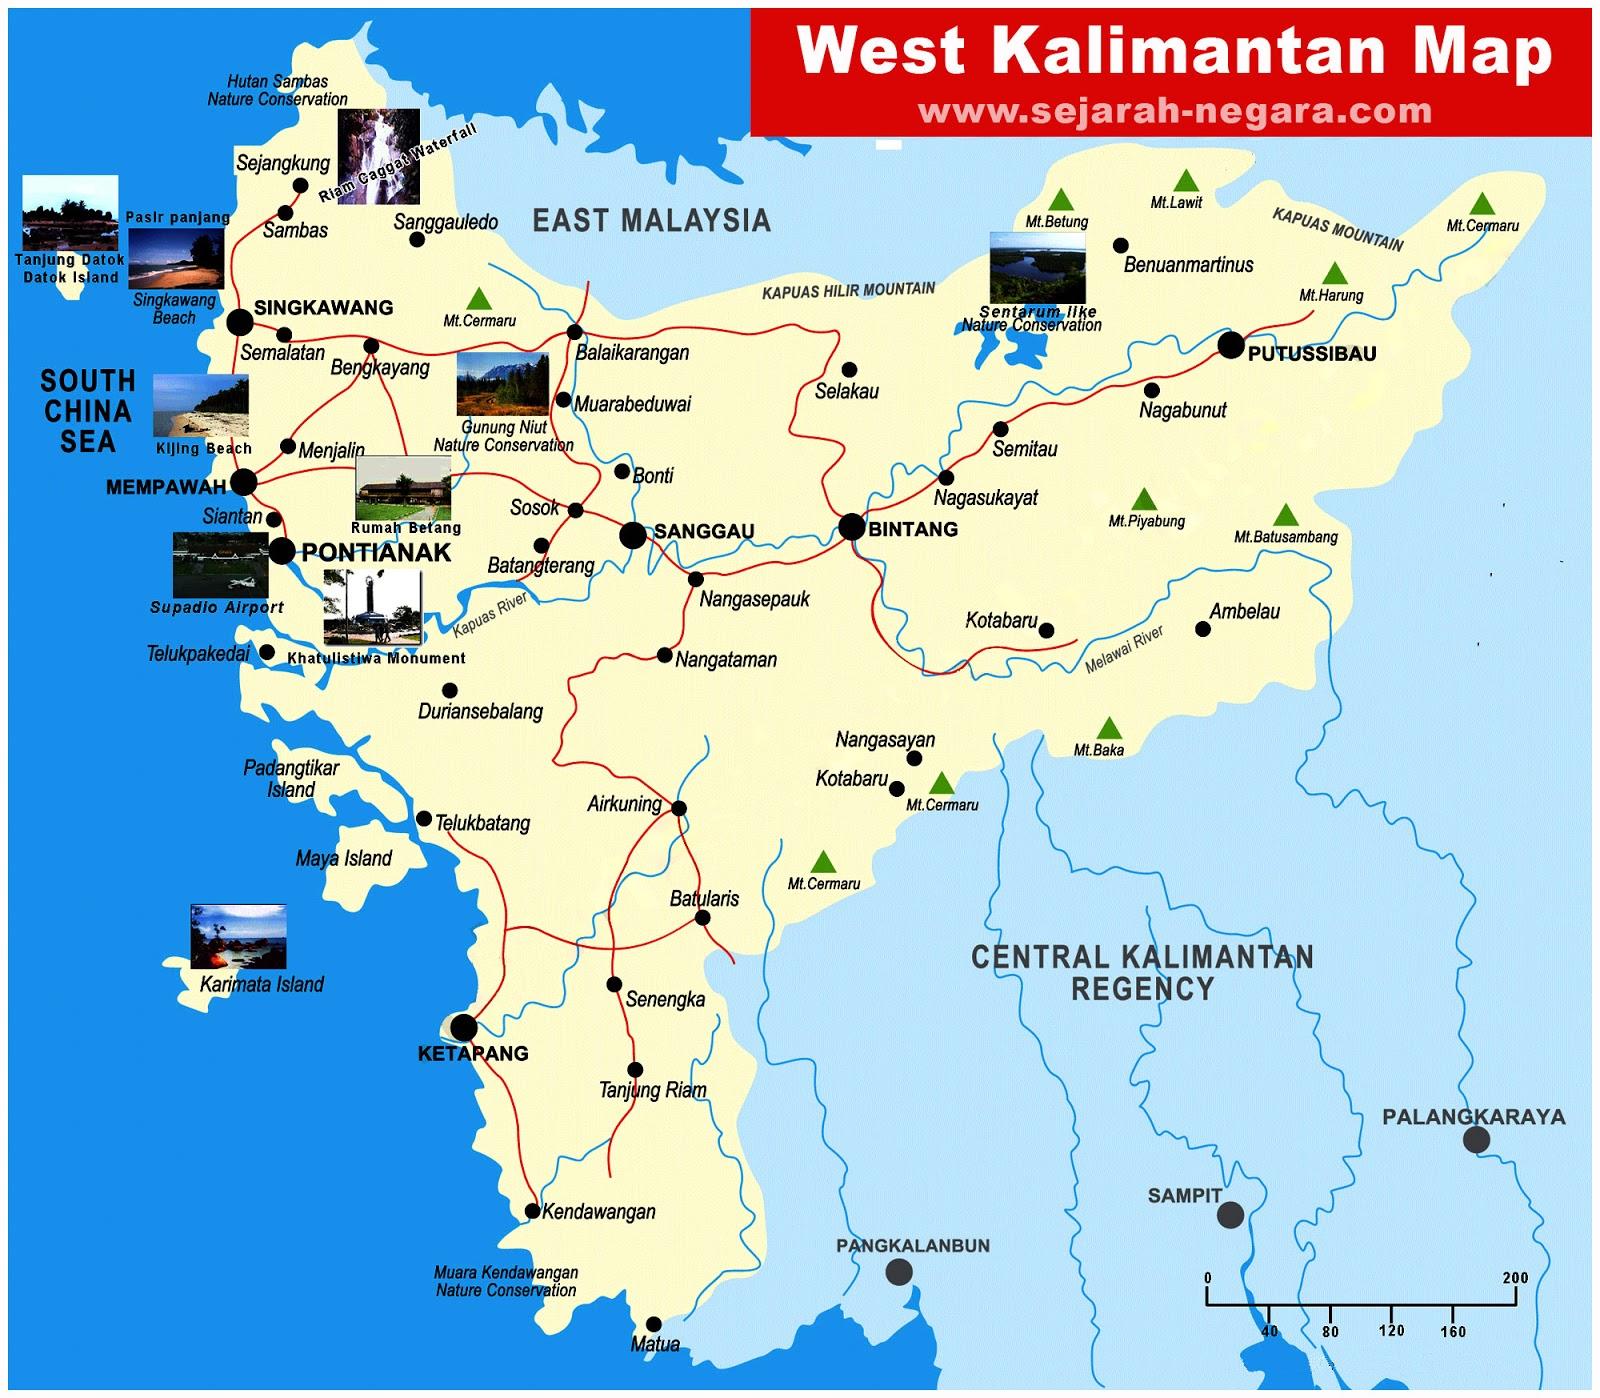 image: Map of West Kalimantan